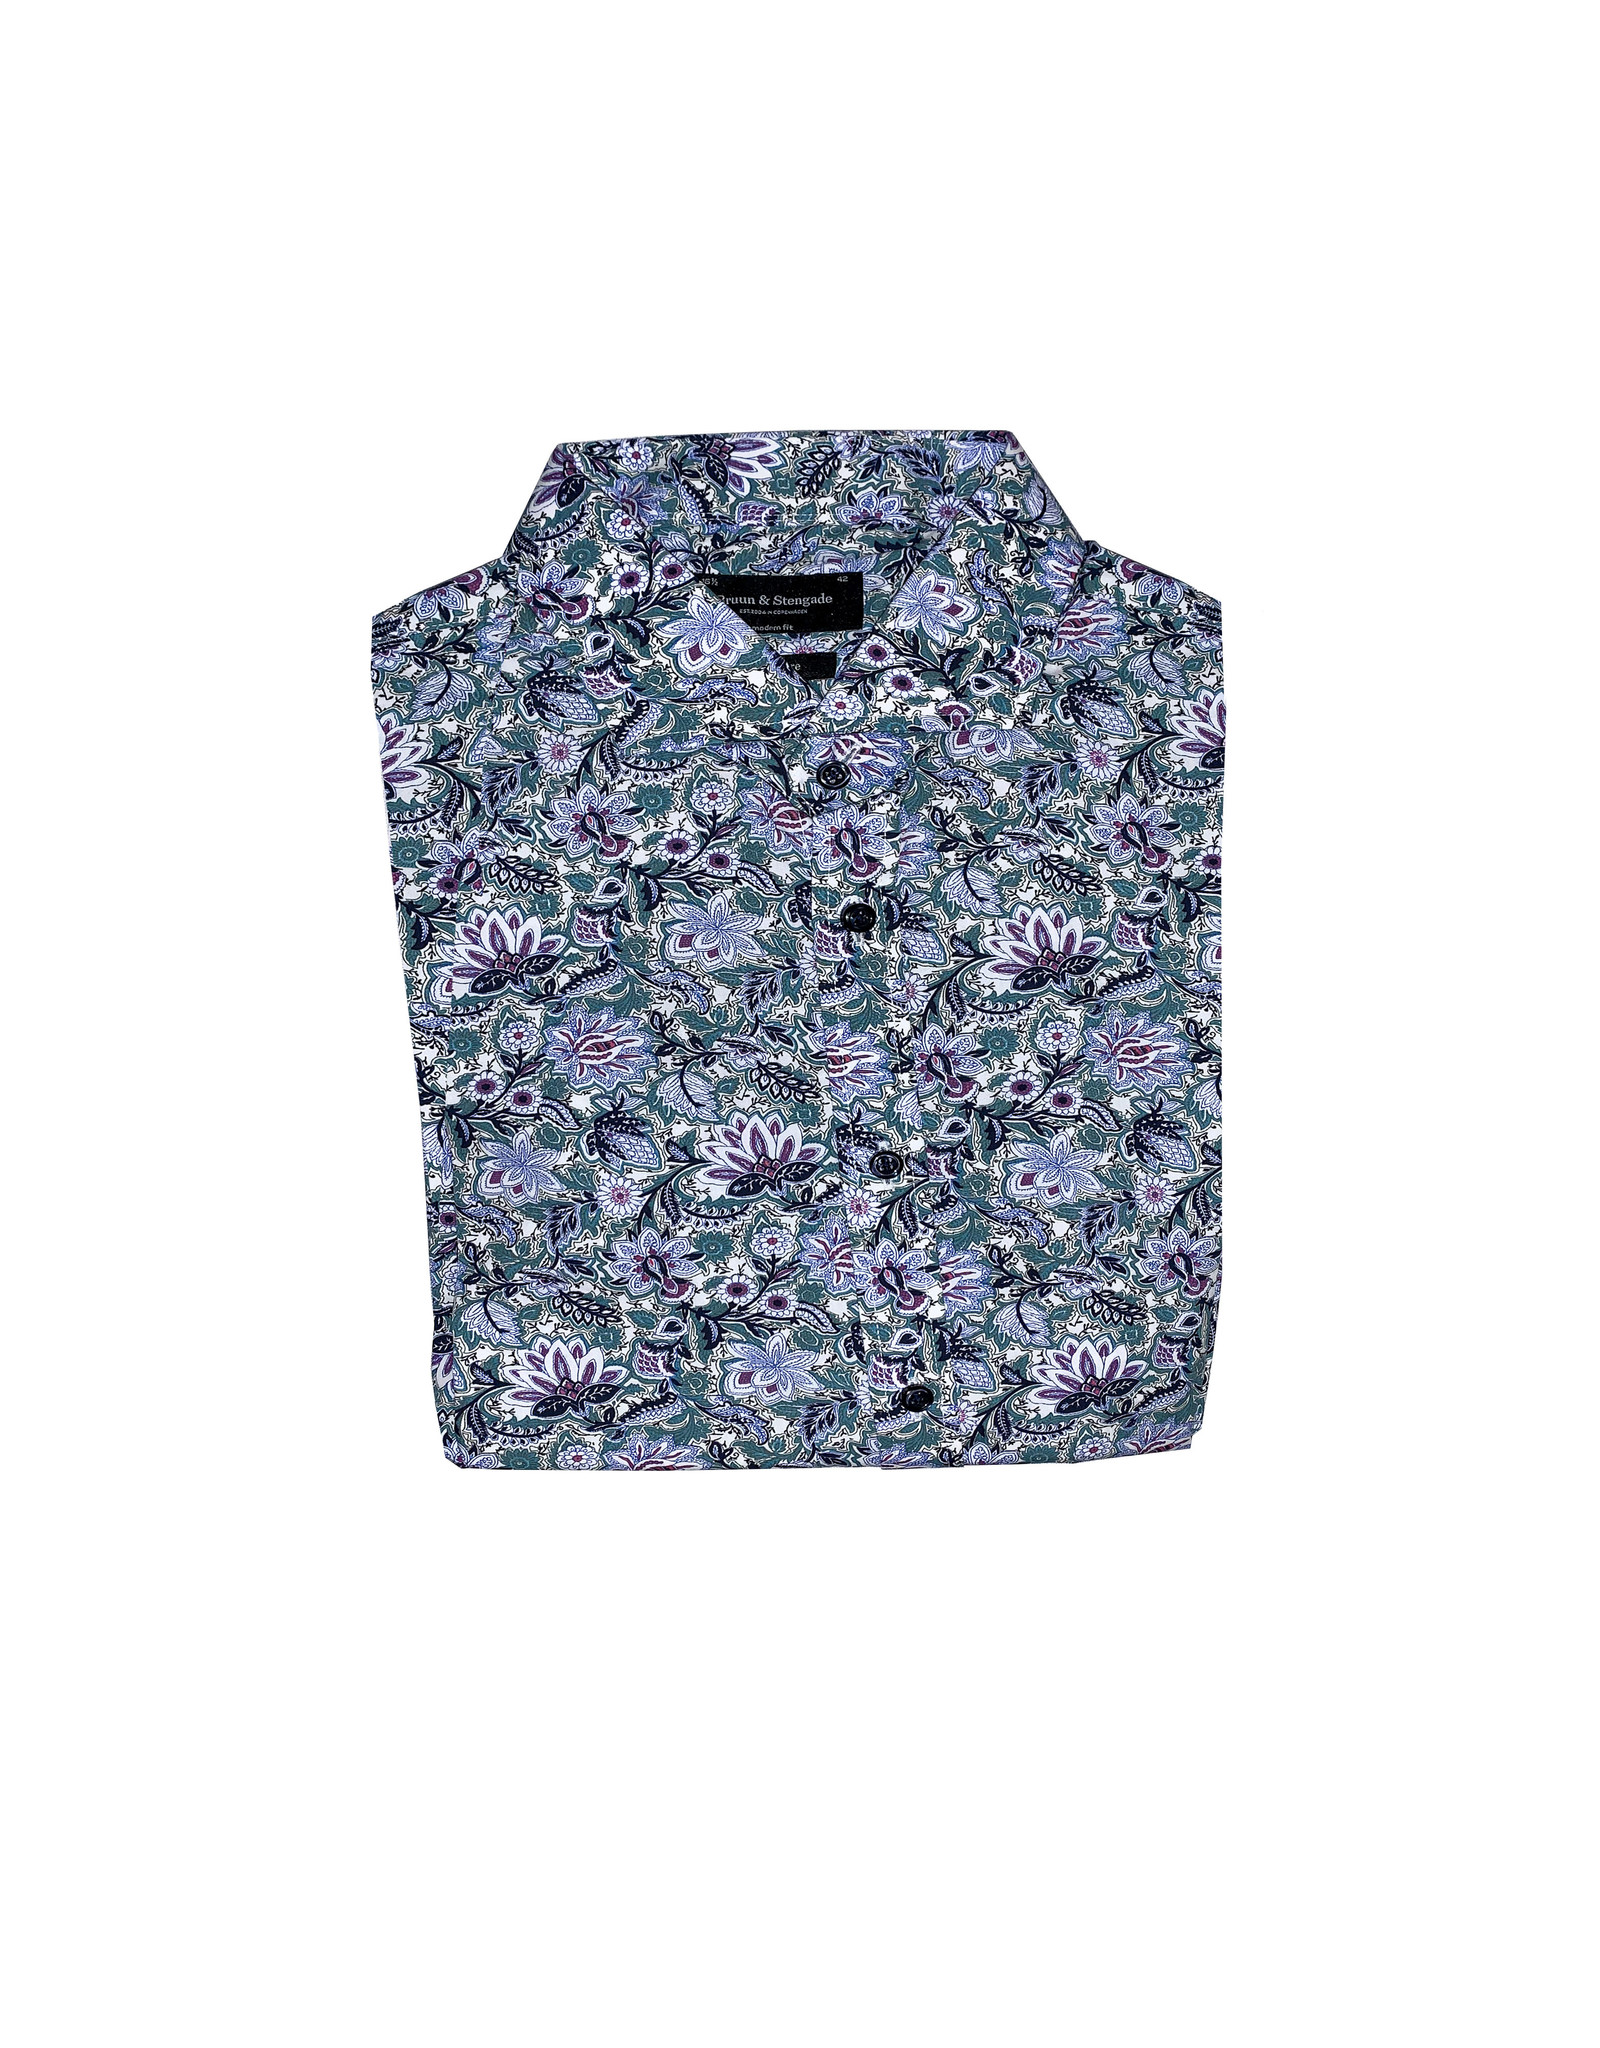 Bruun & Stengade Bruun & Stengade Floral Dress Shirt